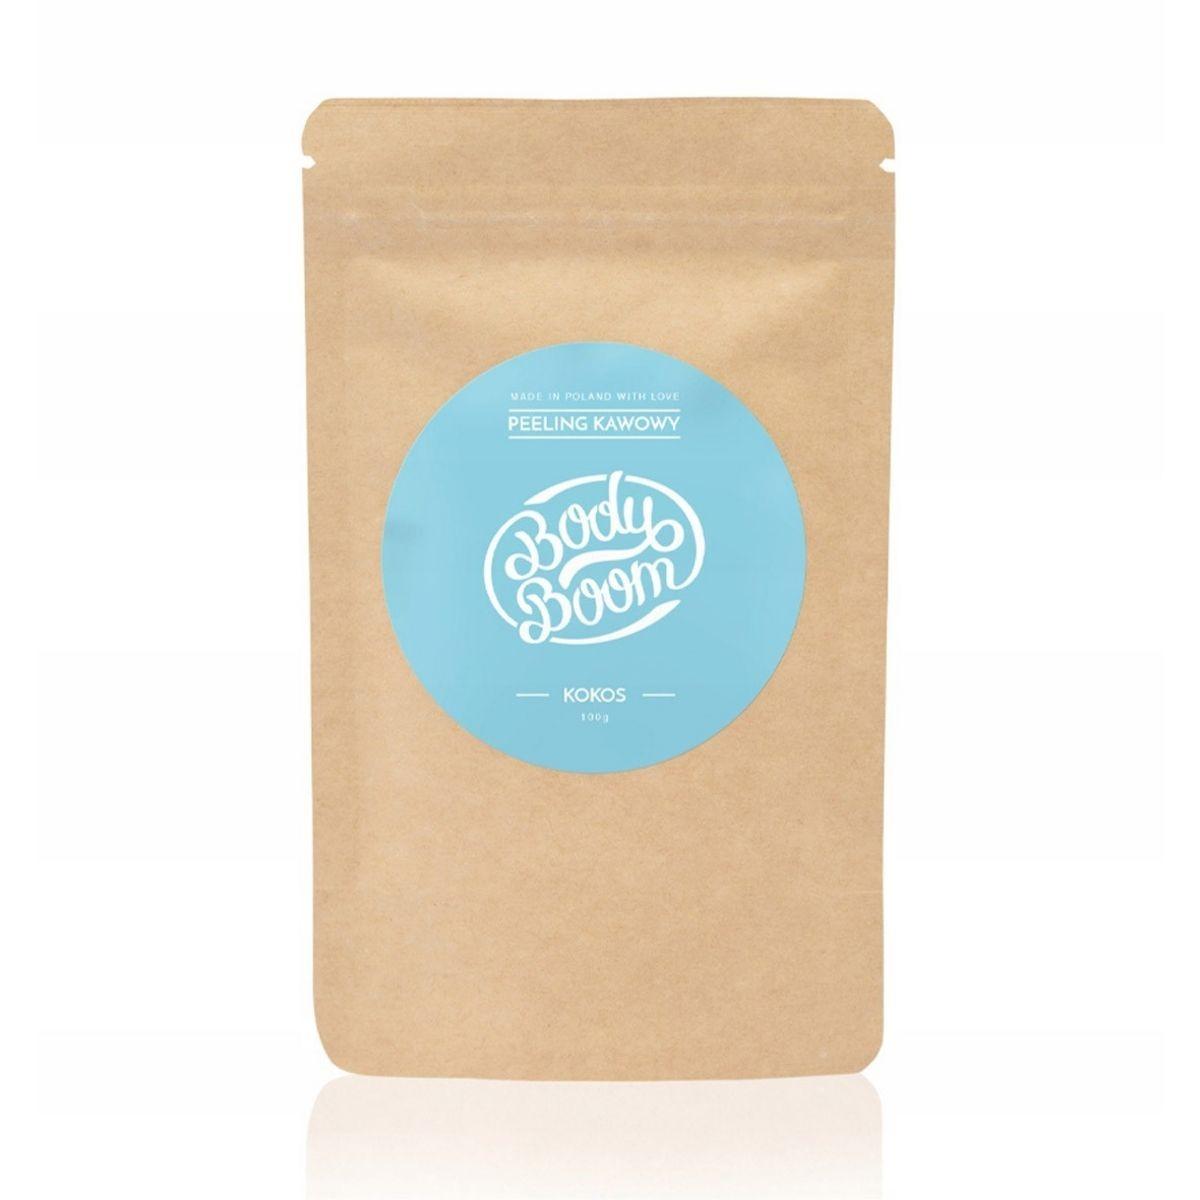 BODY BOOM Peeling Kawowy 100g - Kokos